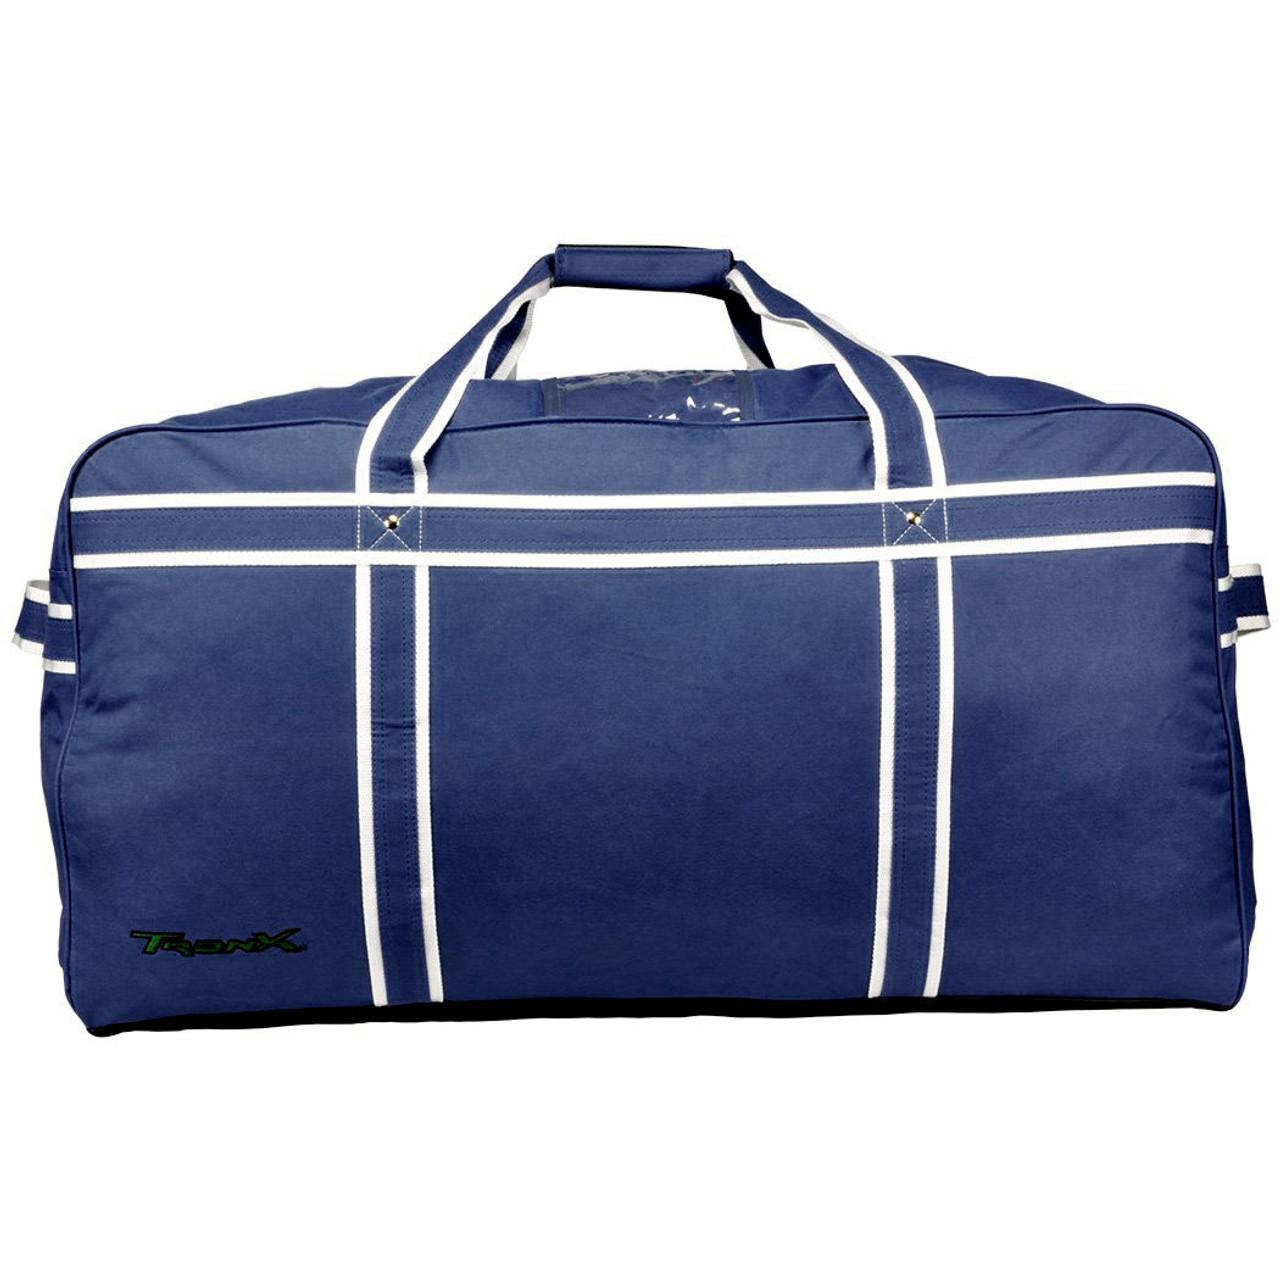 TronX Velocity Senior Wheeled Hockey Equipment Bags